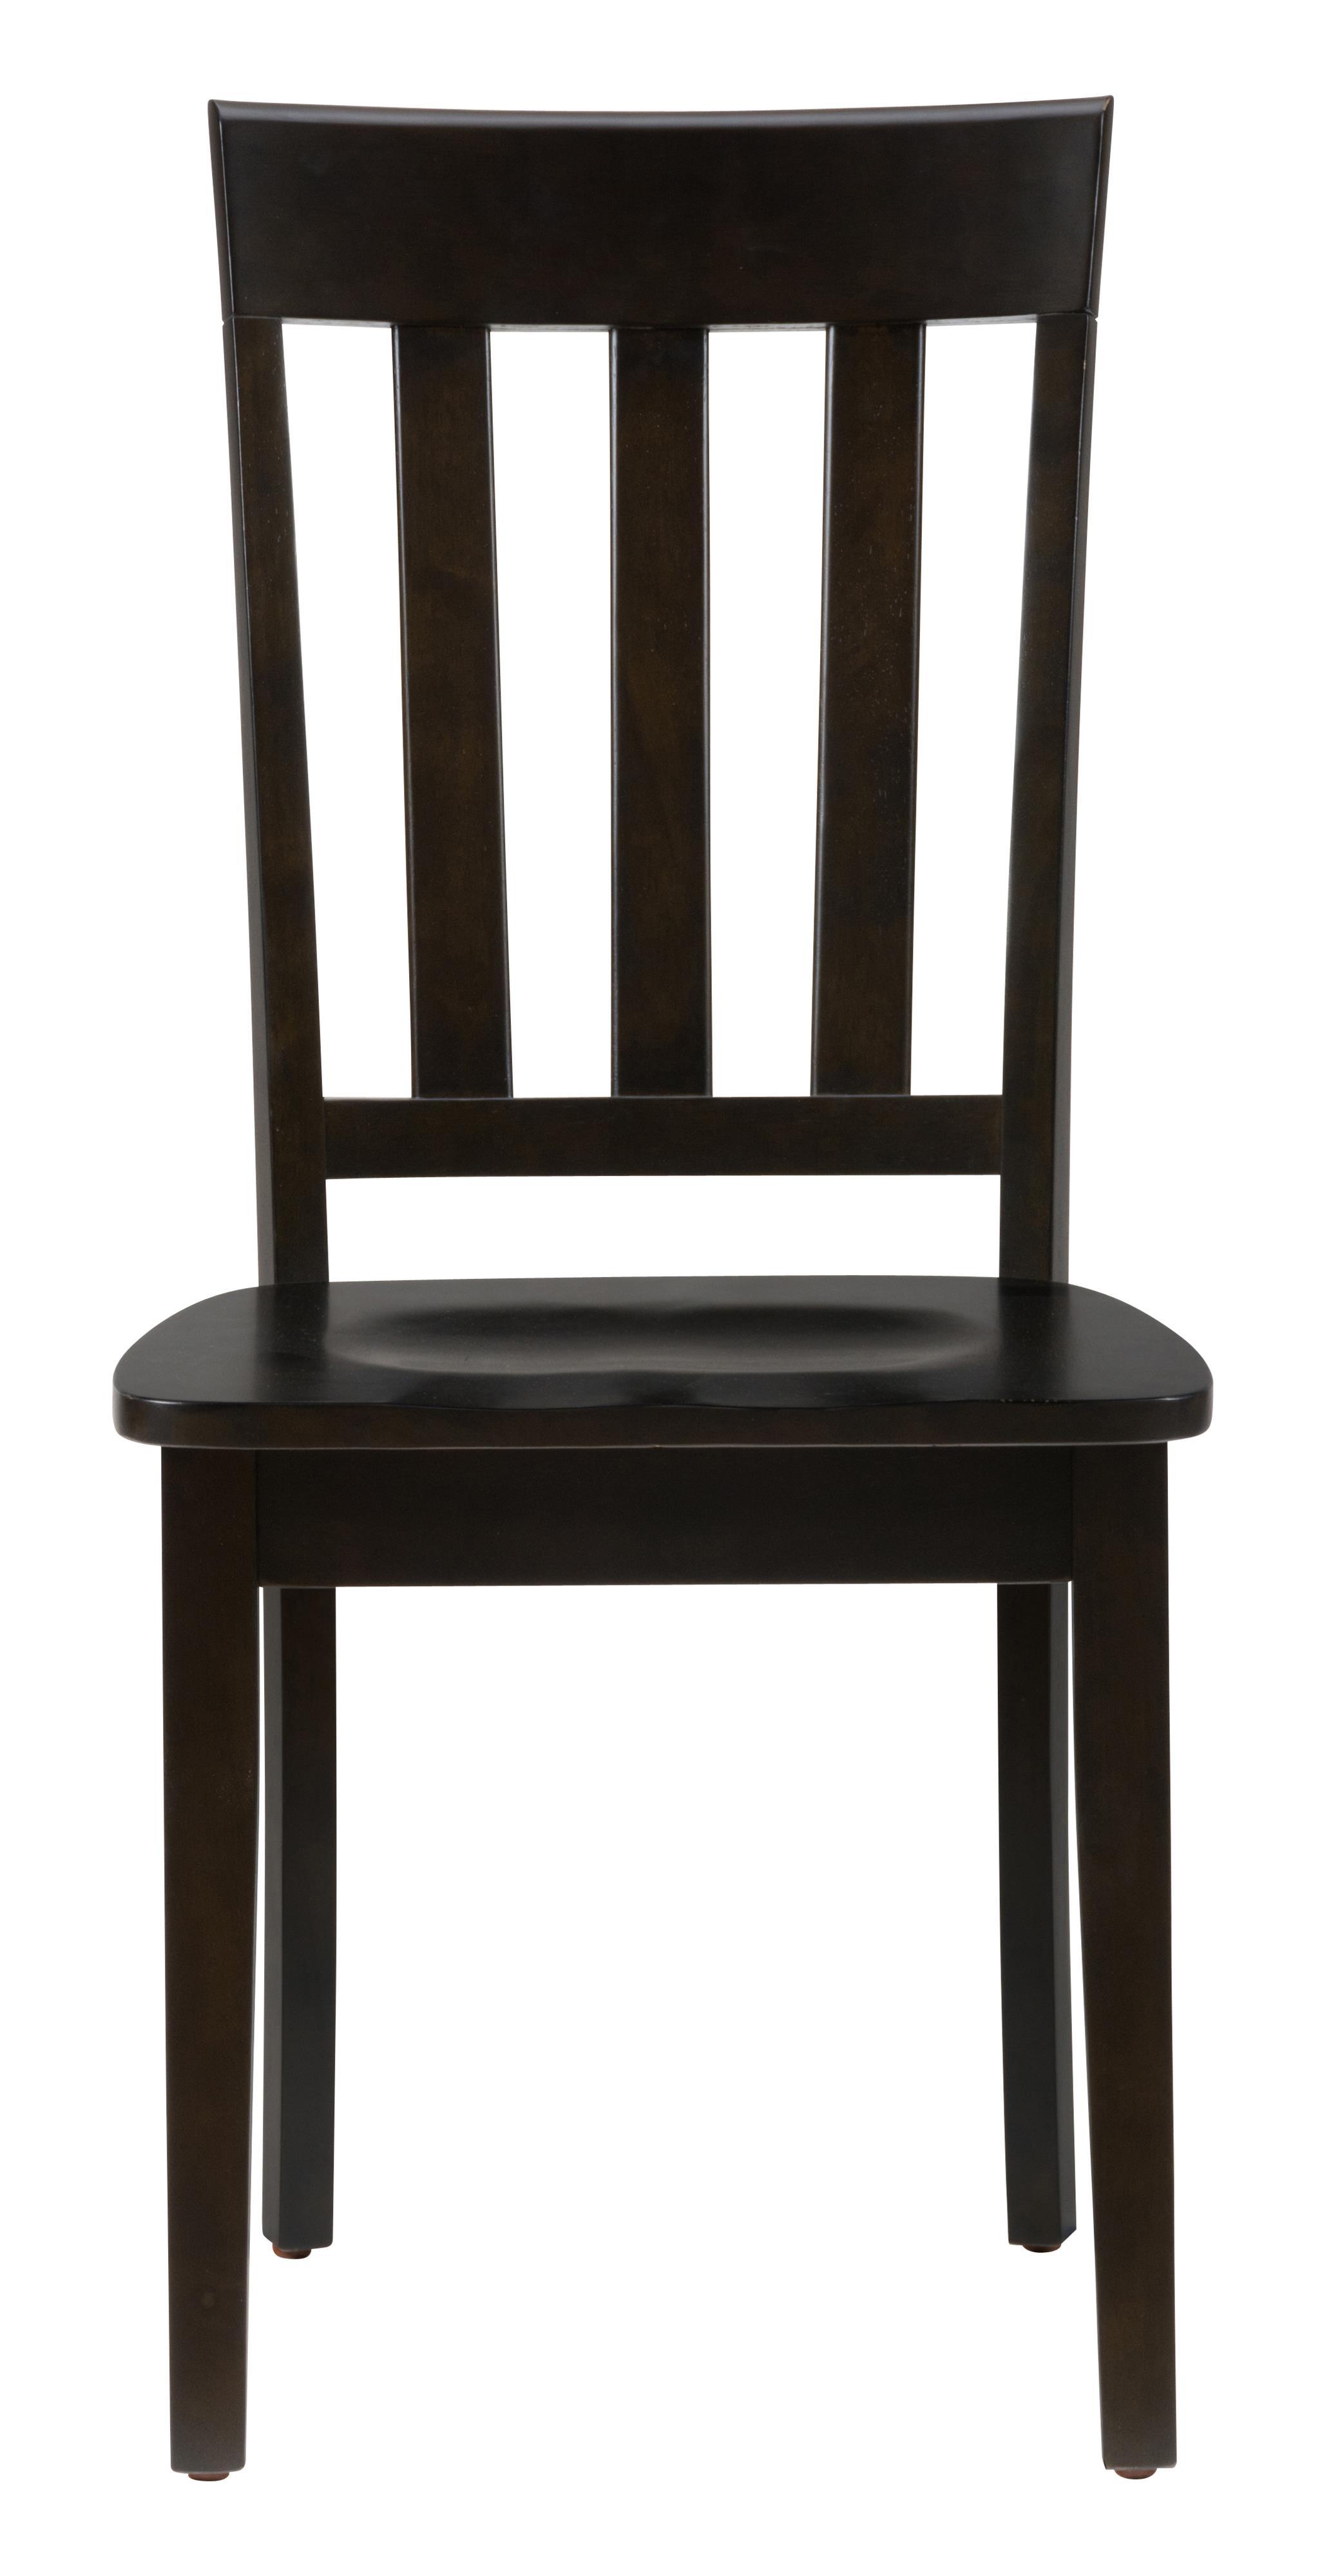 Jofran 3x3x3  Espresso Slat Back Side Chair for Table